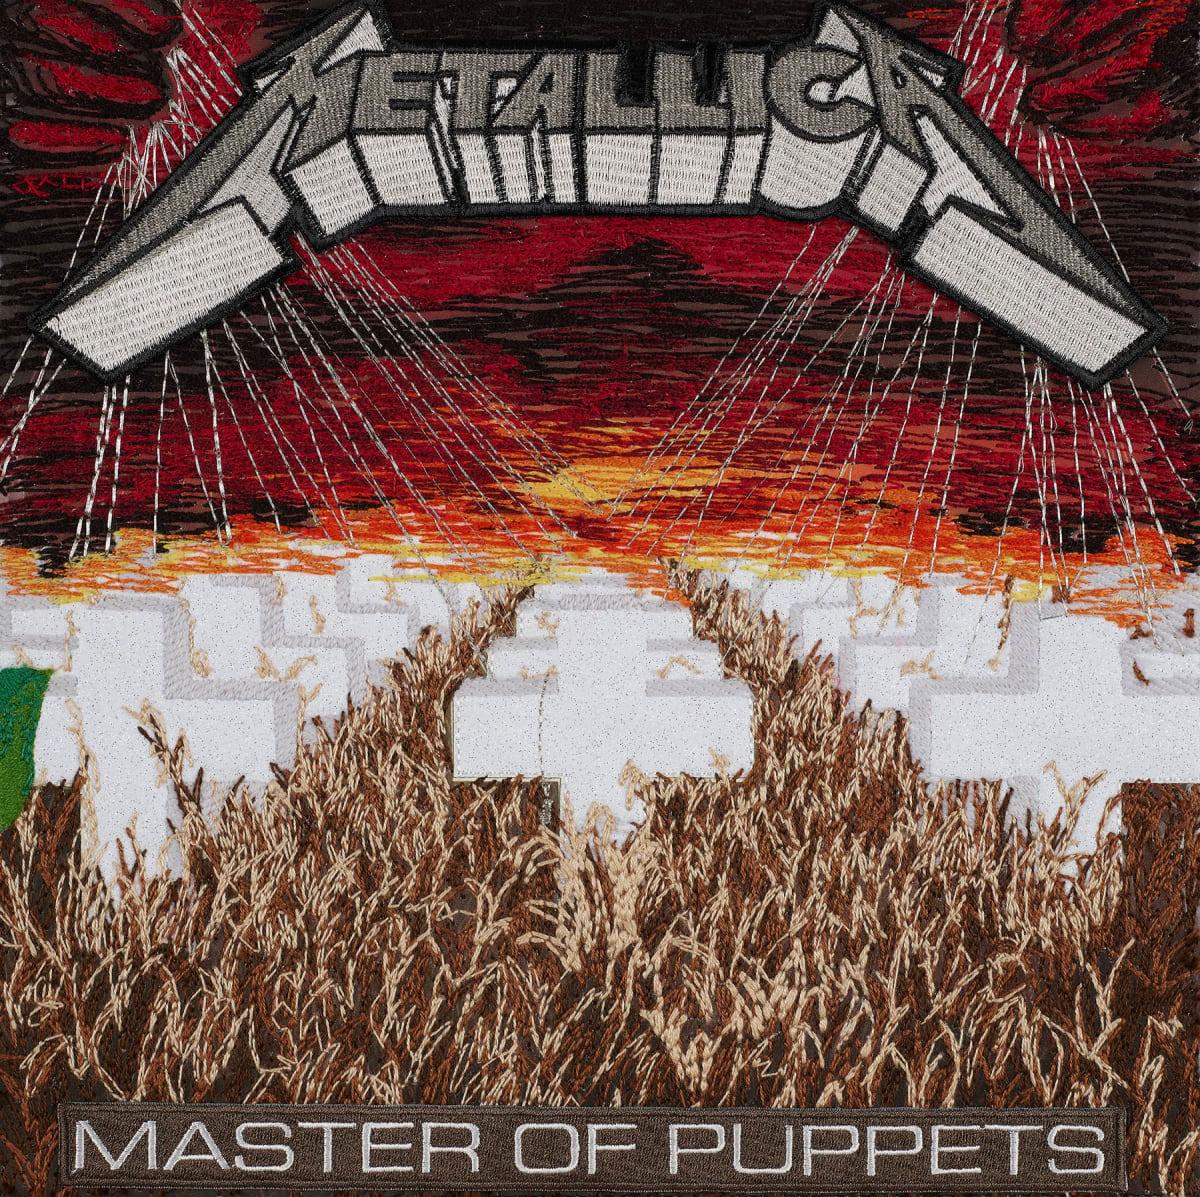 Stephen Wilson, Master of Puppets, Metallica, 2019